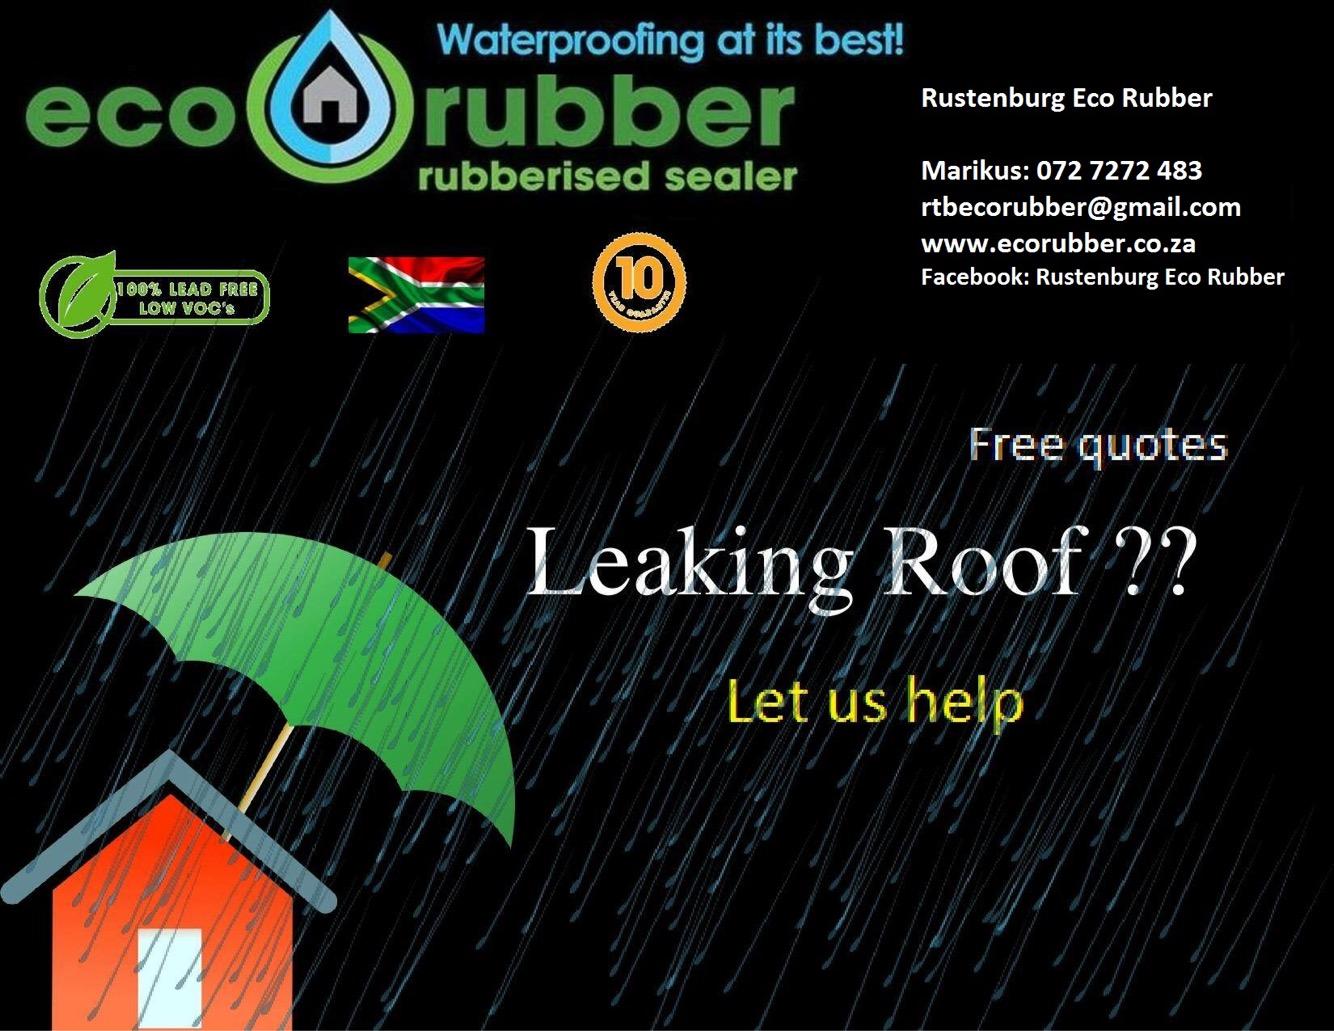 Rustenburg eco rubber